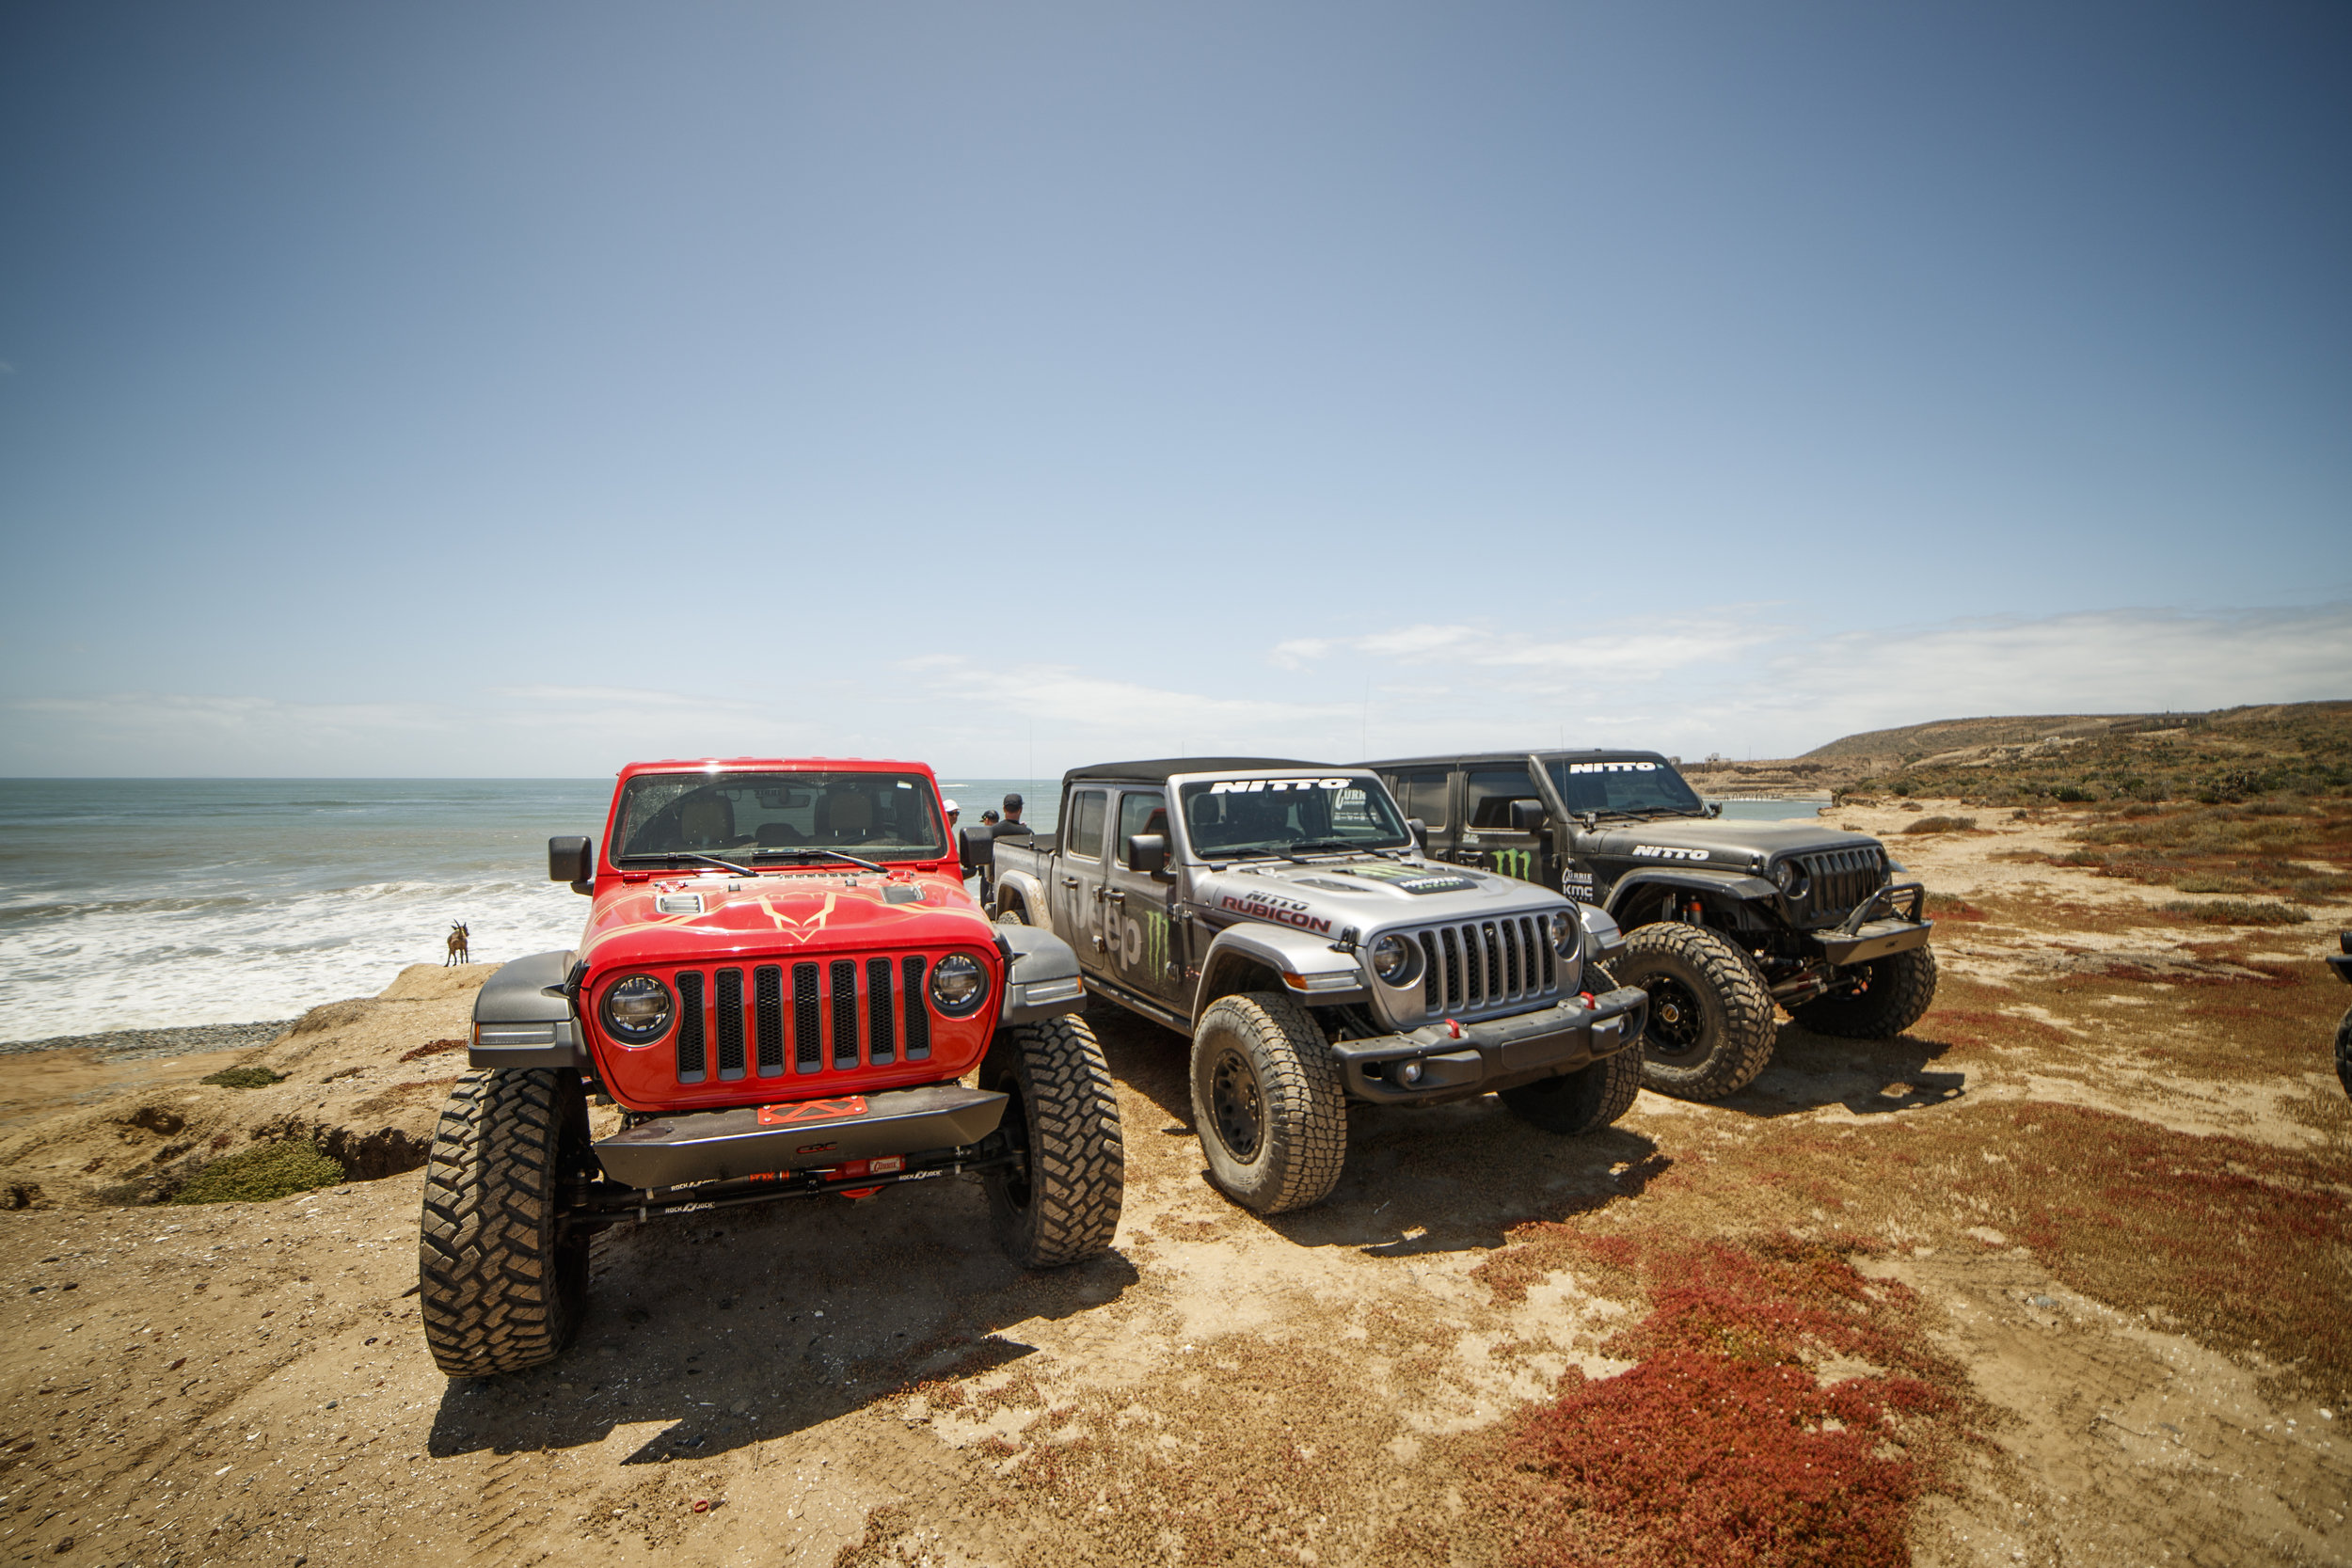 6_24_CaseyCurrie_Baja500PreRunning_BajaMexico_Jeep_021.jpg